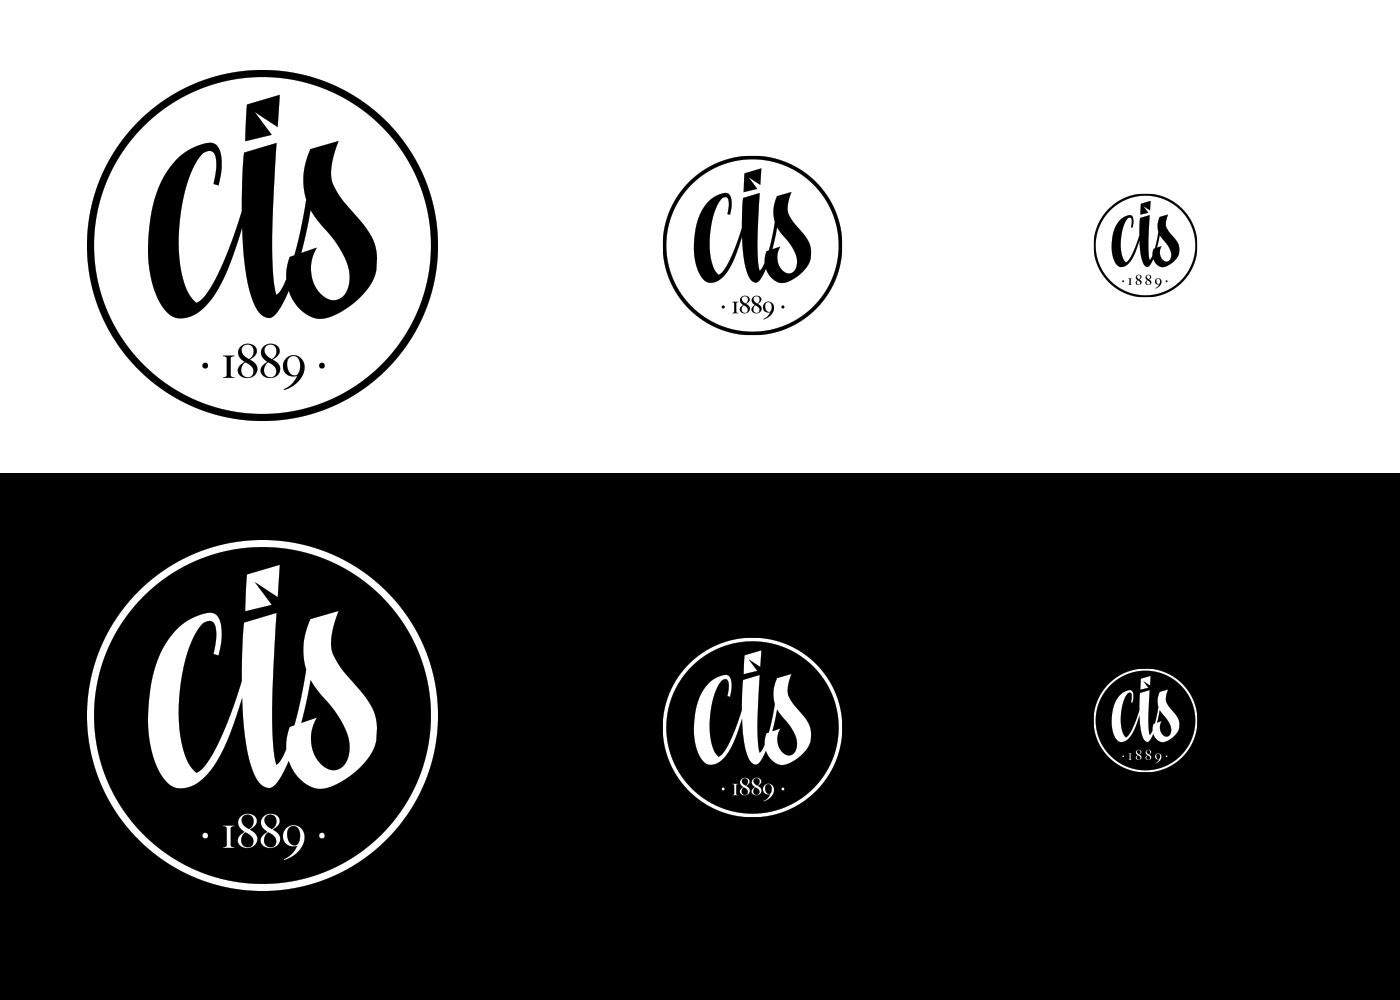 03 Macelleria cis logotipo grafico milano